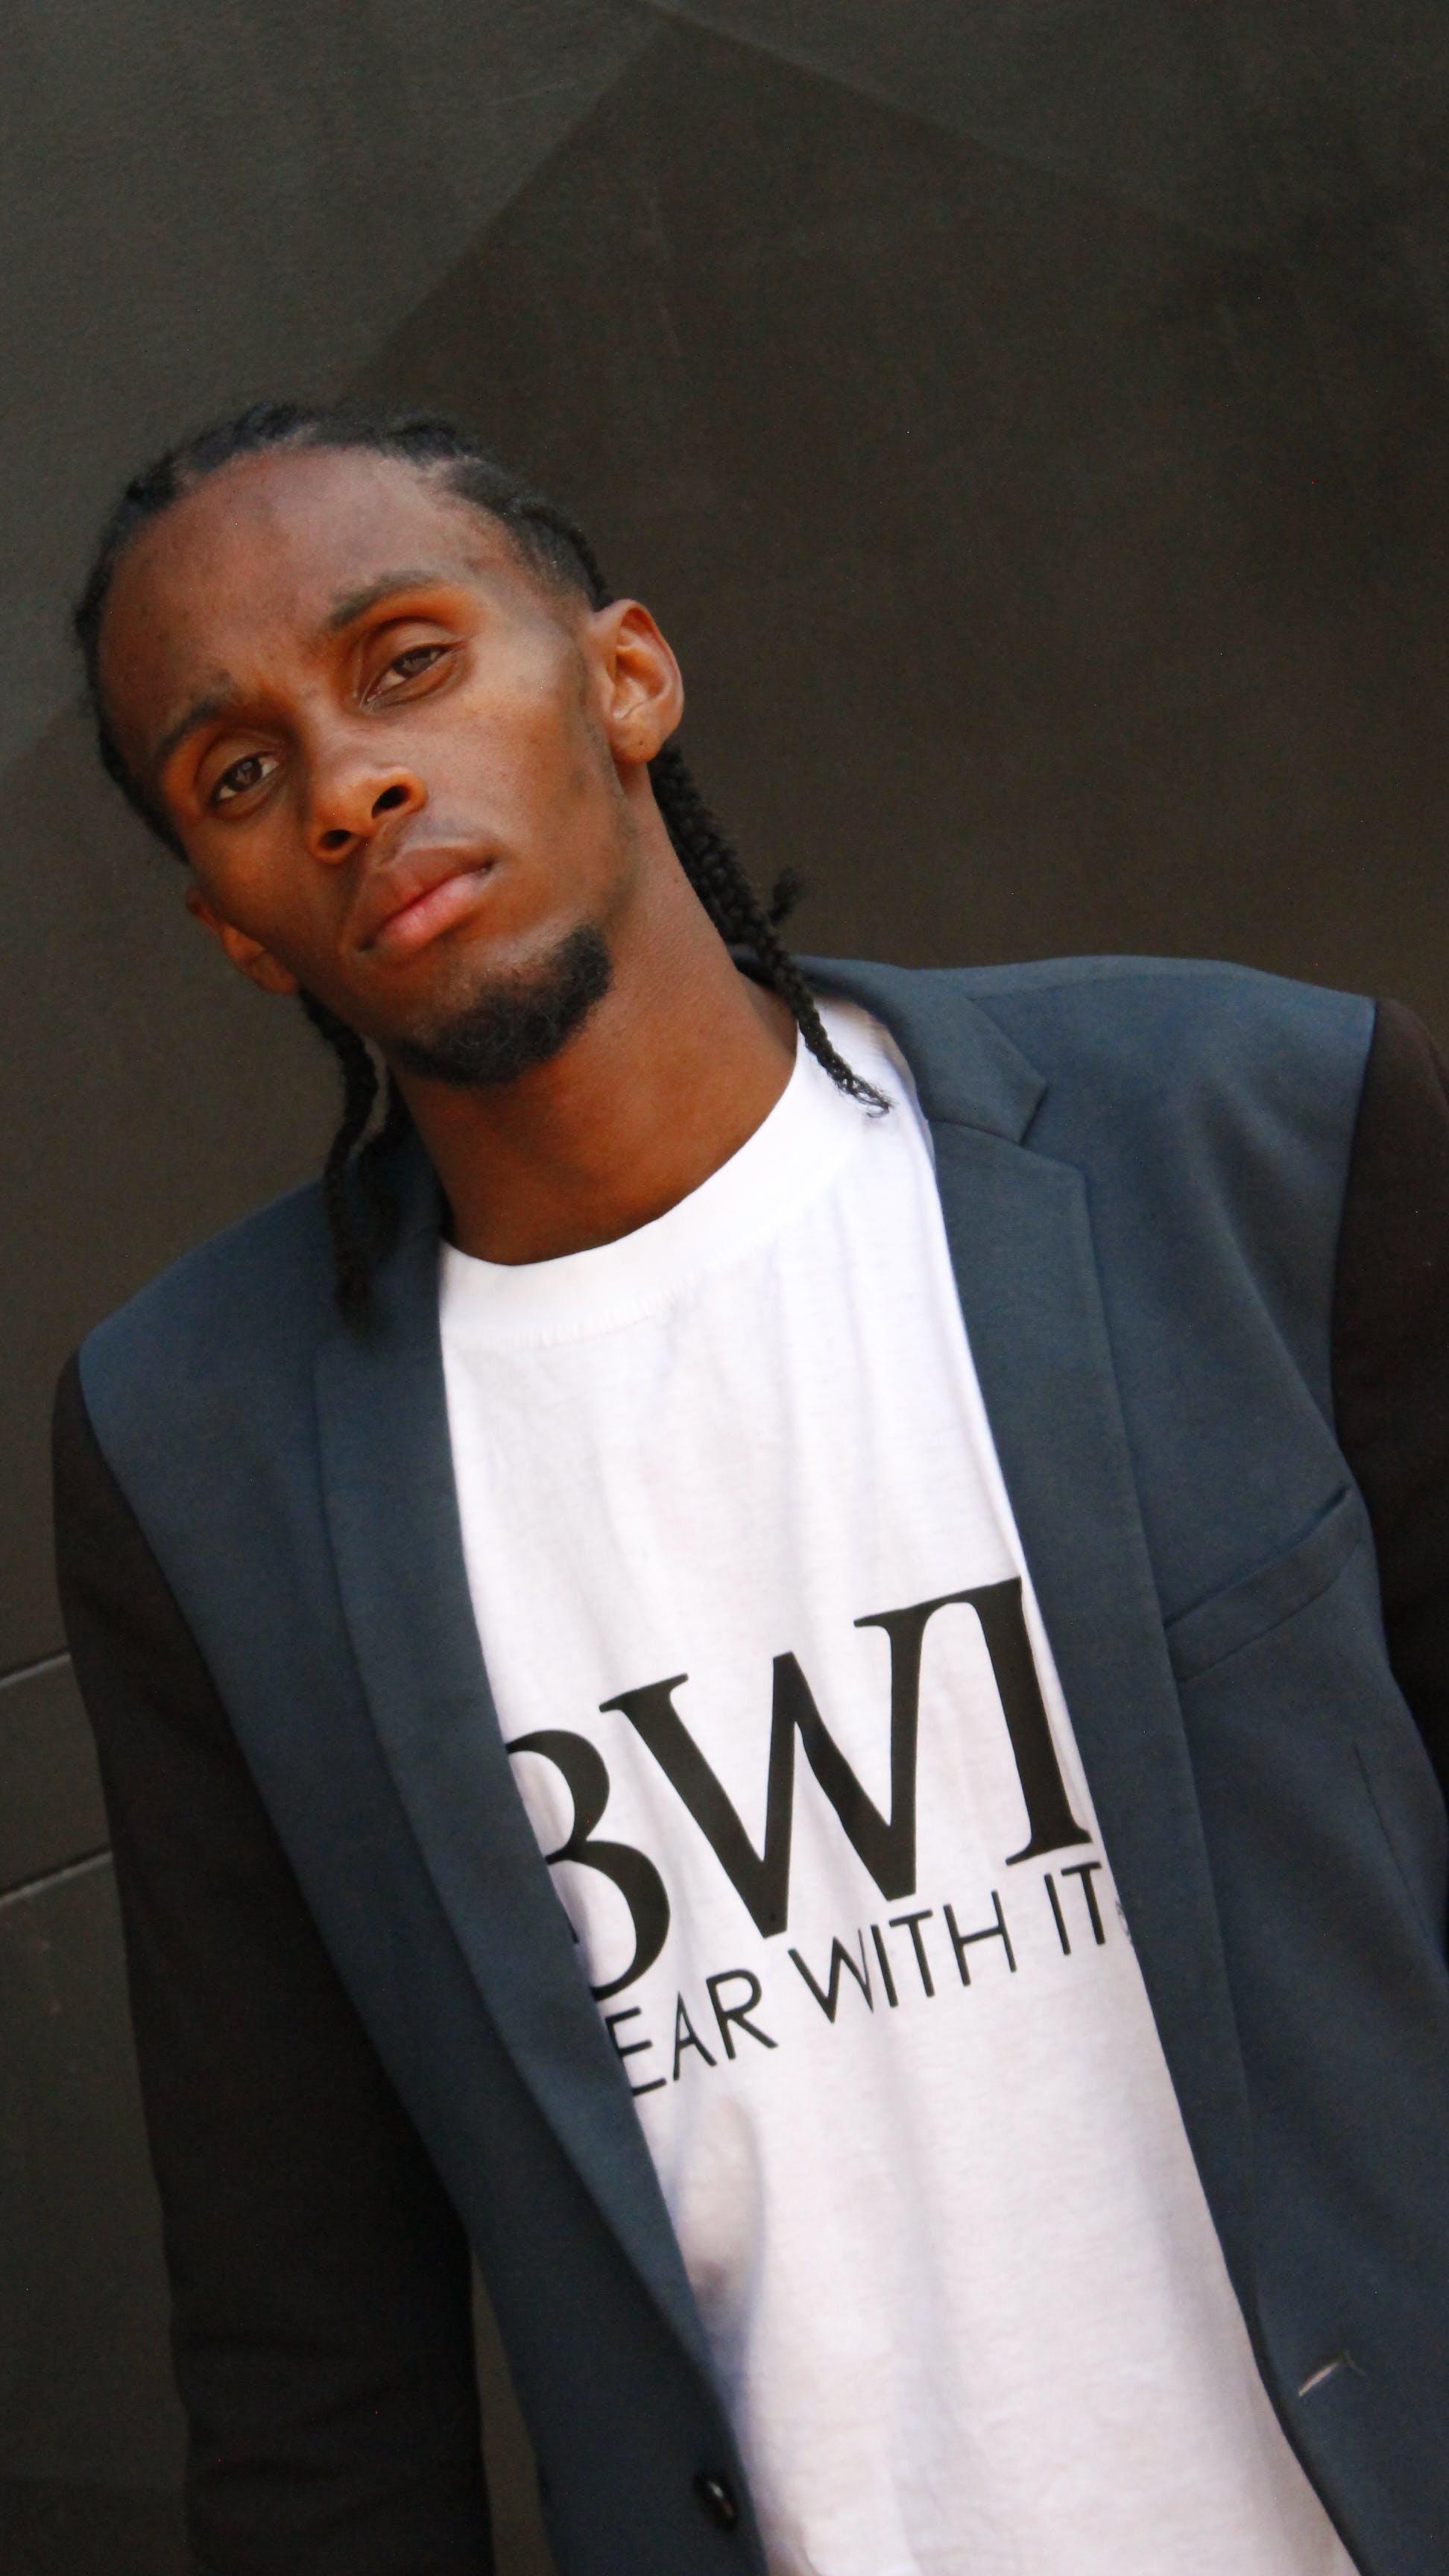 Free stock photo of african american man, fashion, fashion model, male model